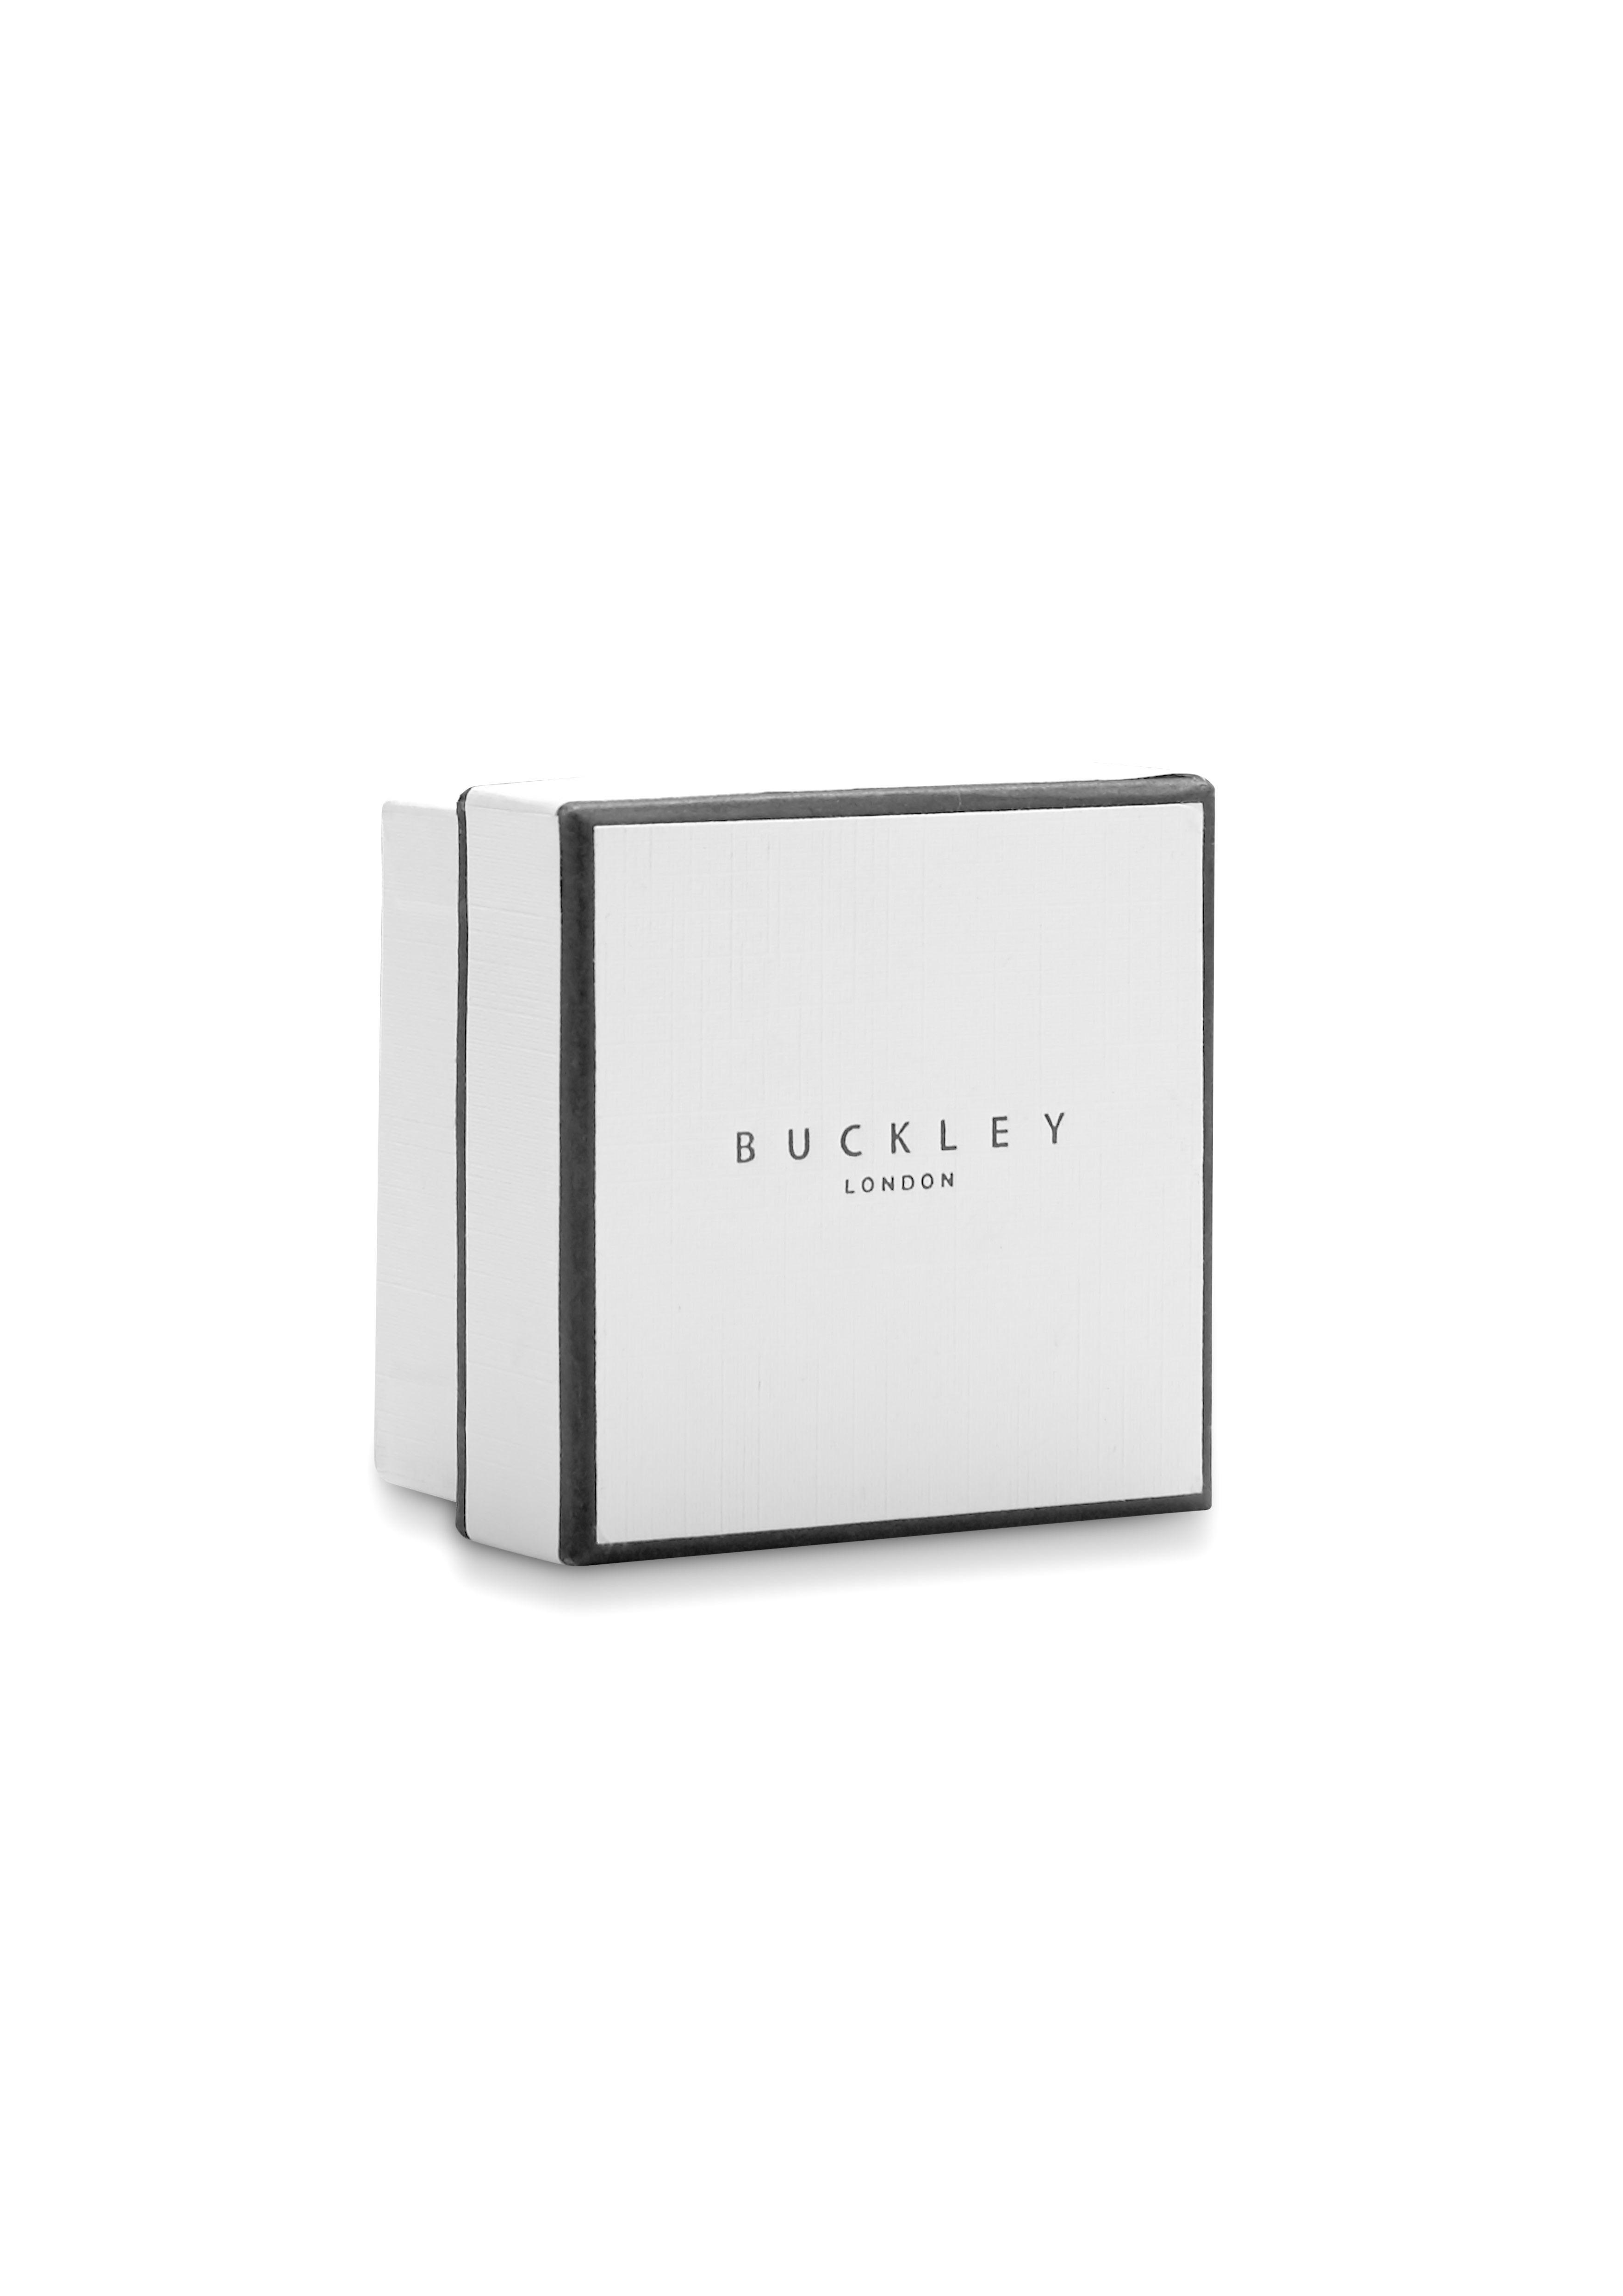 Buckley London Eyre Signet Ring Box